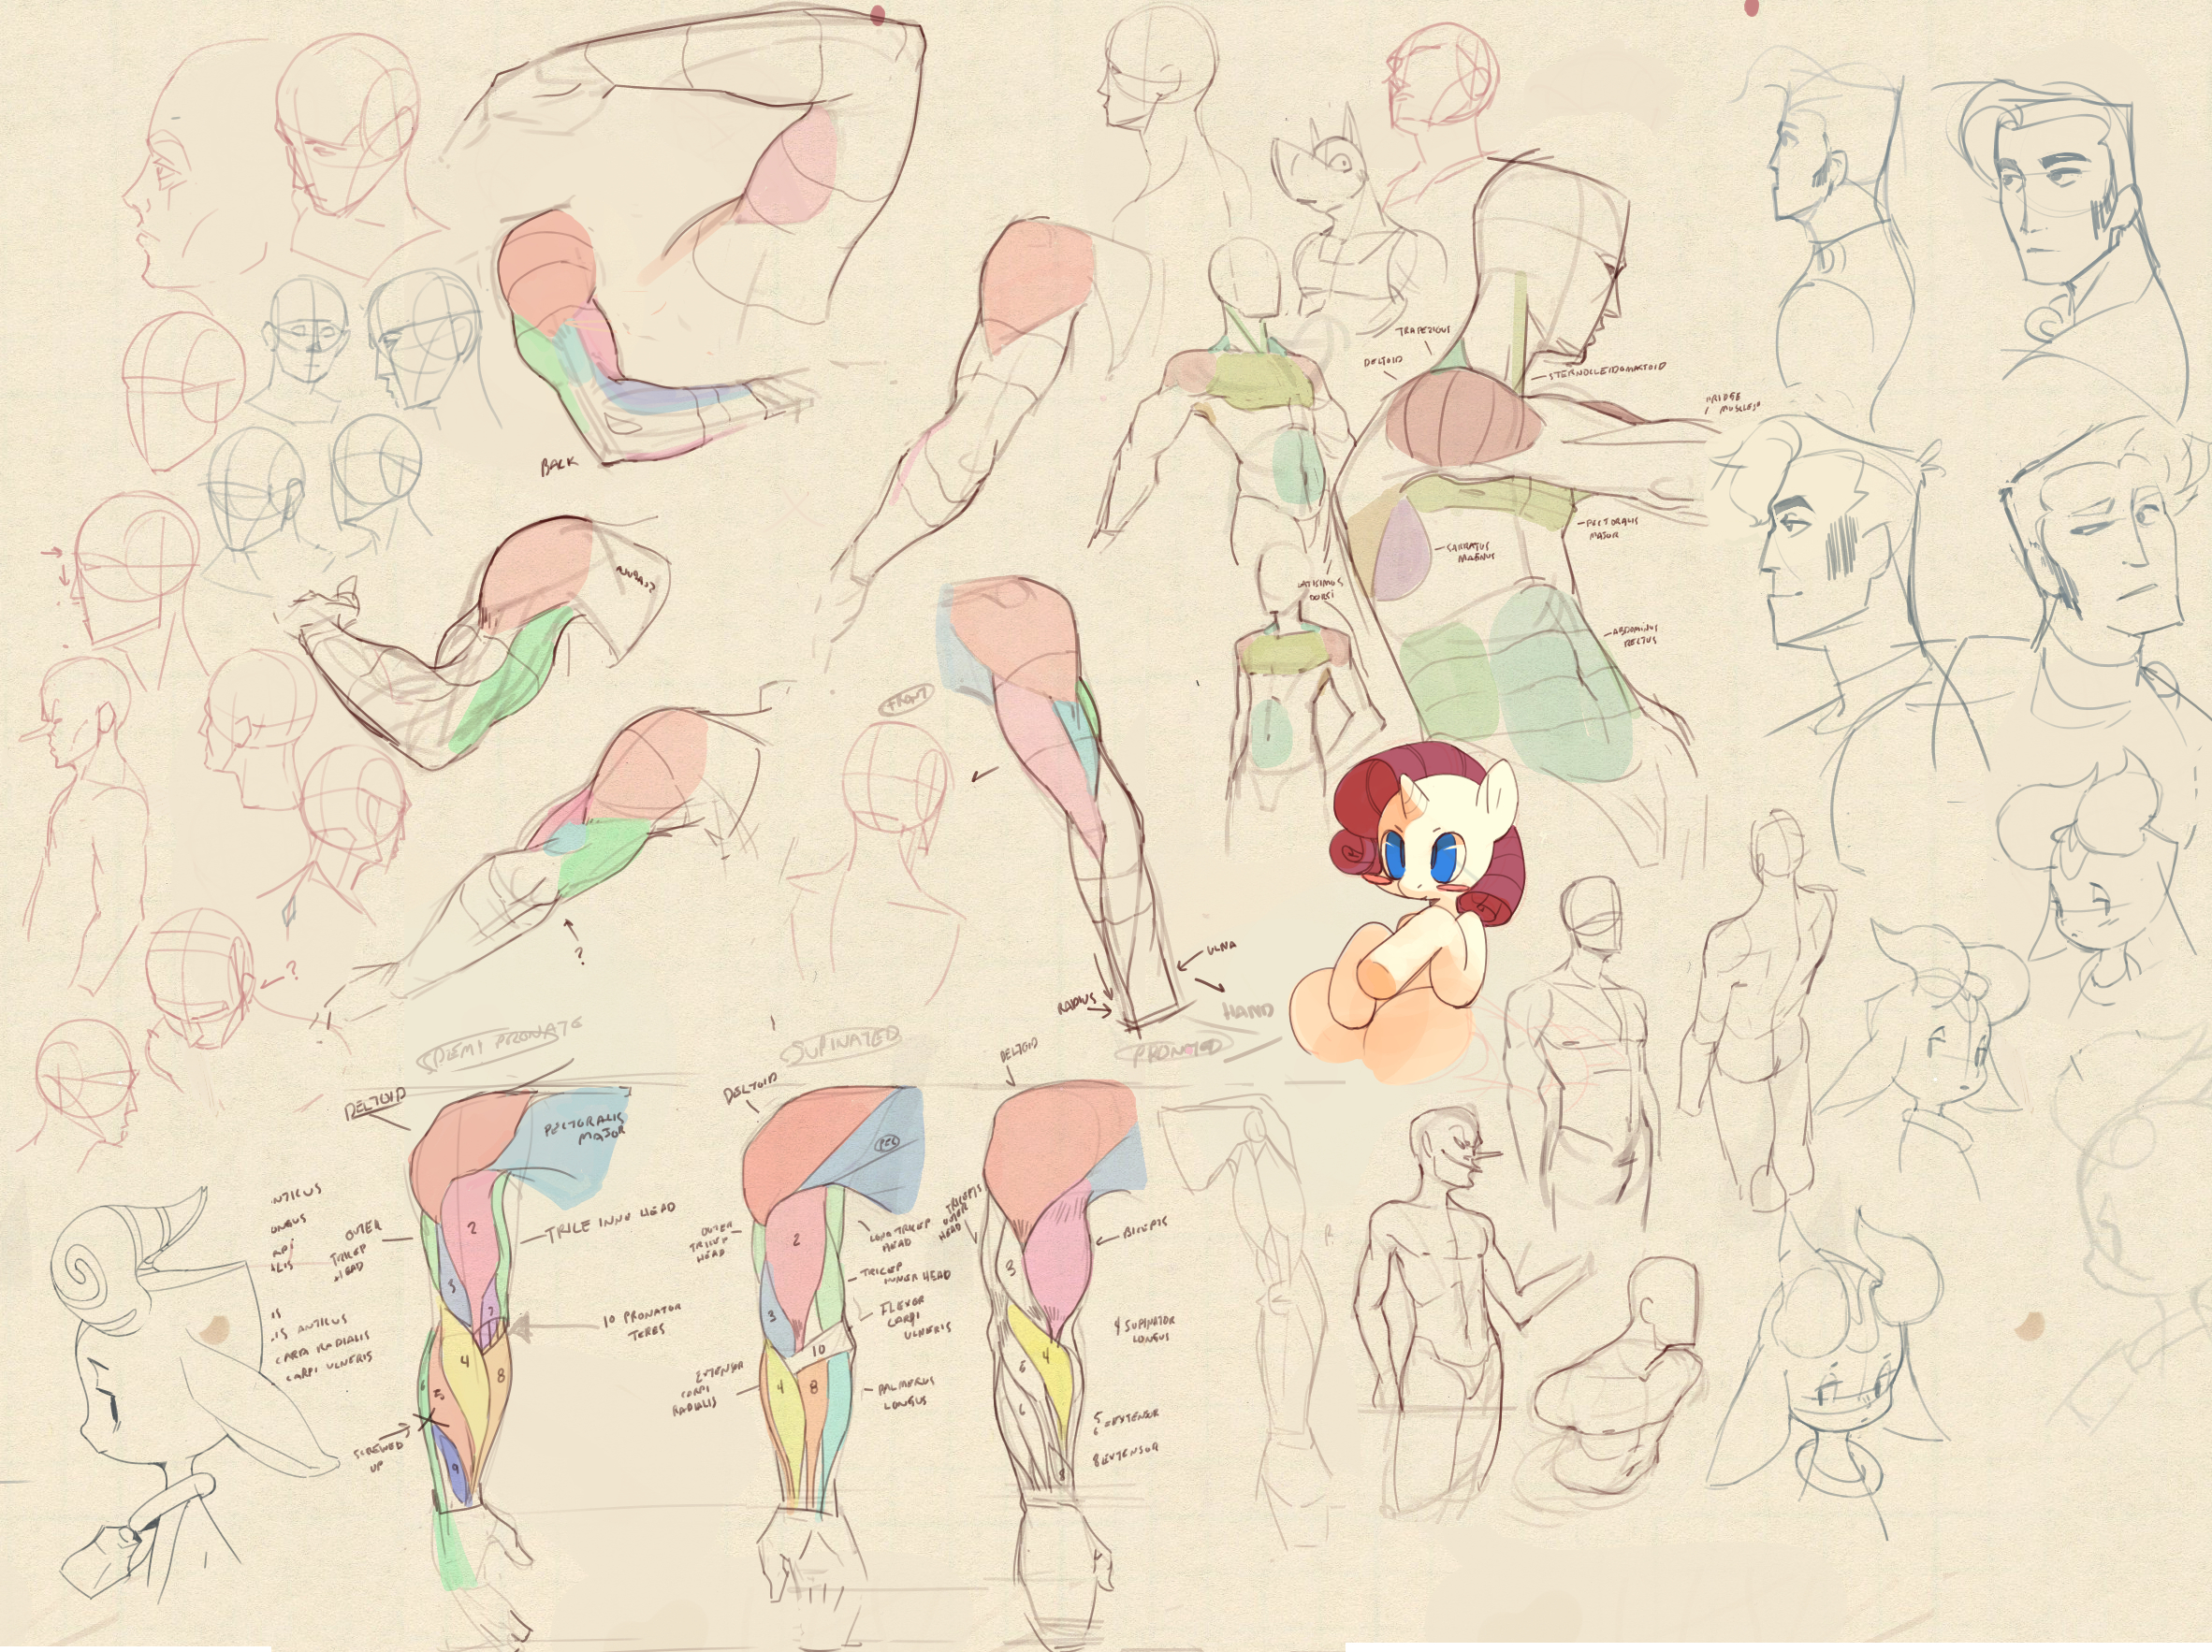 doodle dump by polywomple